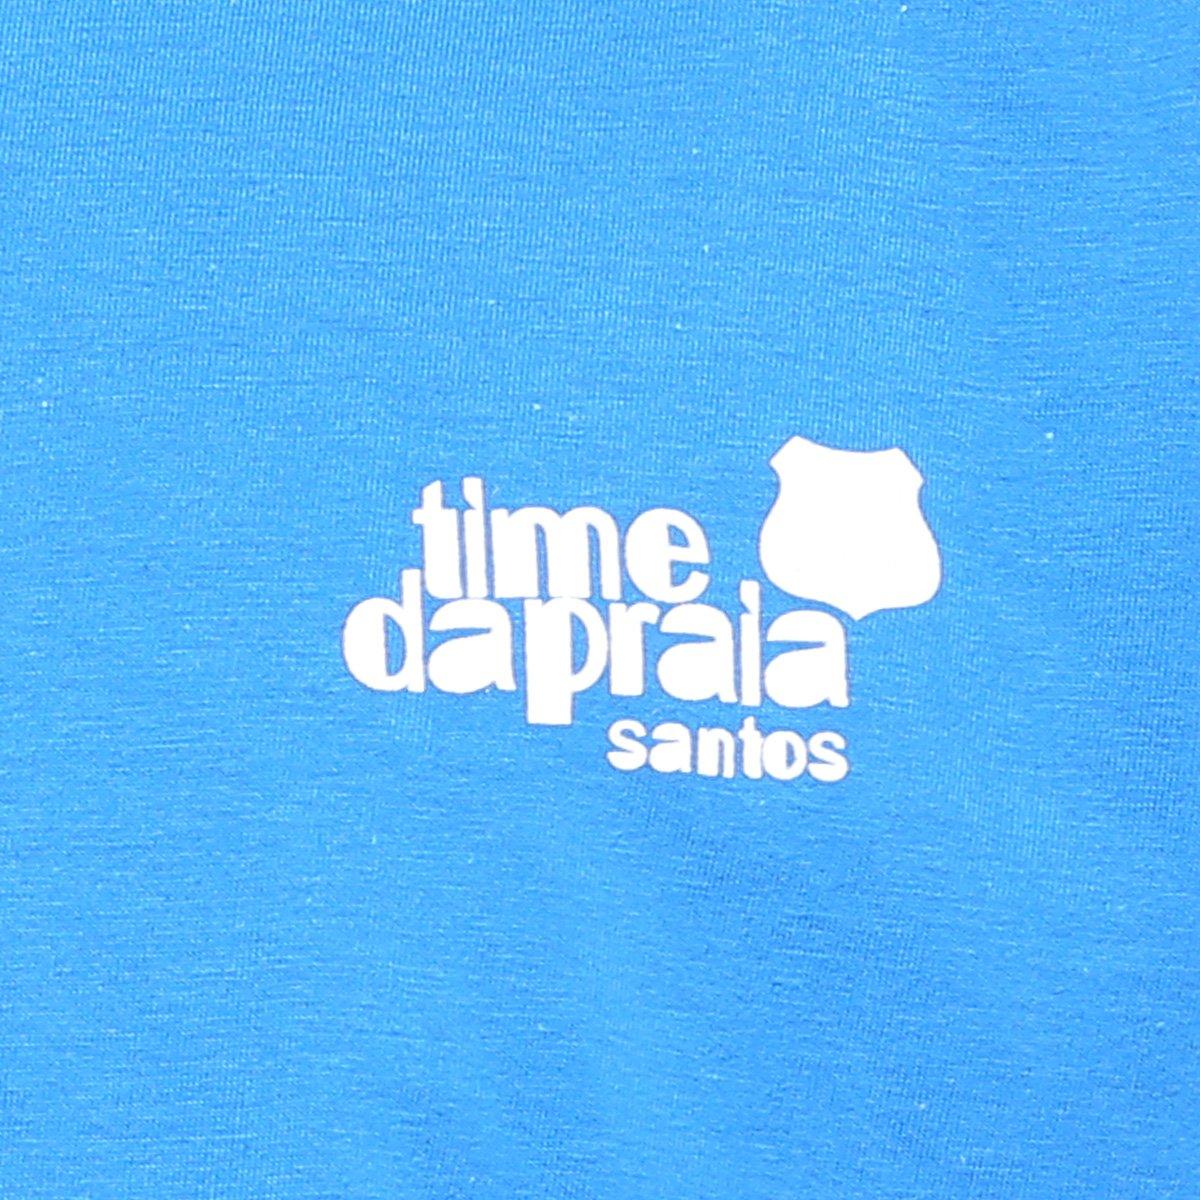 b582b8464a ... Camiseta Santos Futebol Clube Estampada timedapraia Masculina ...